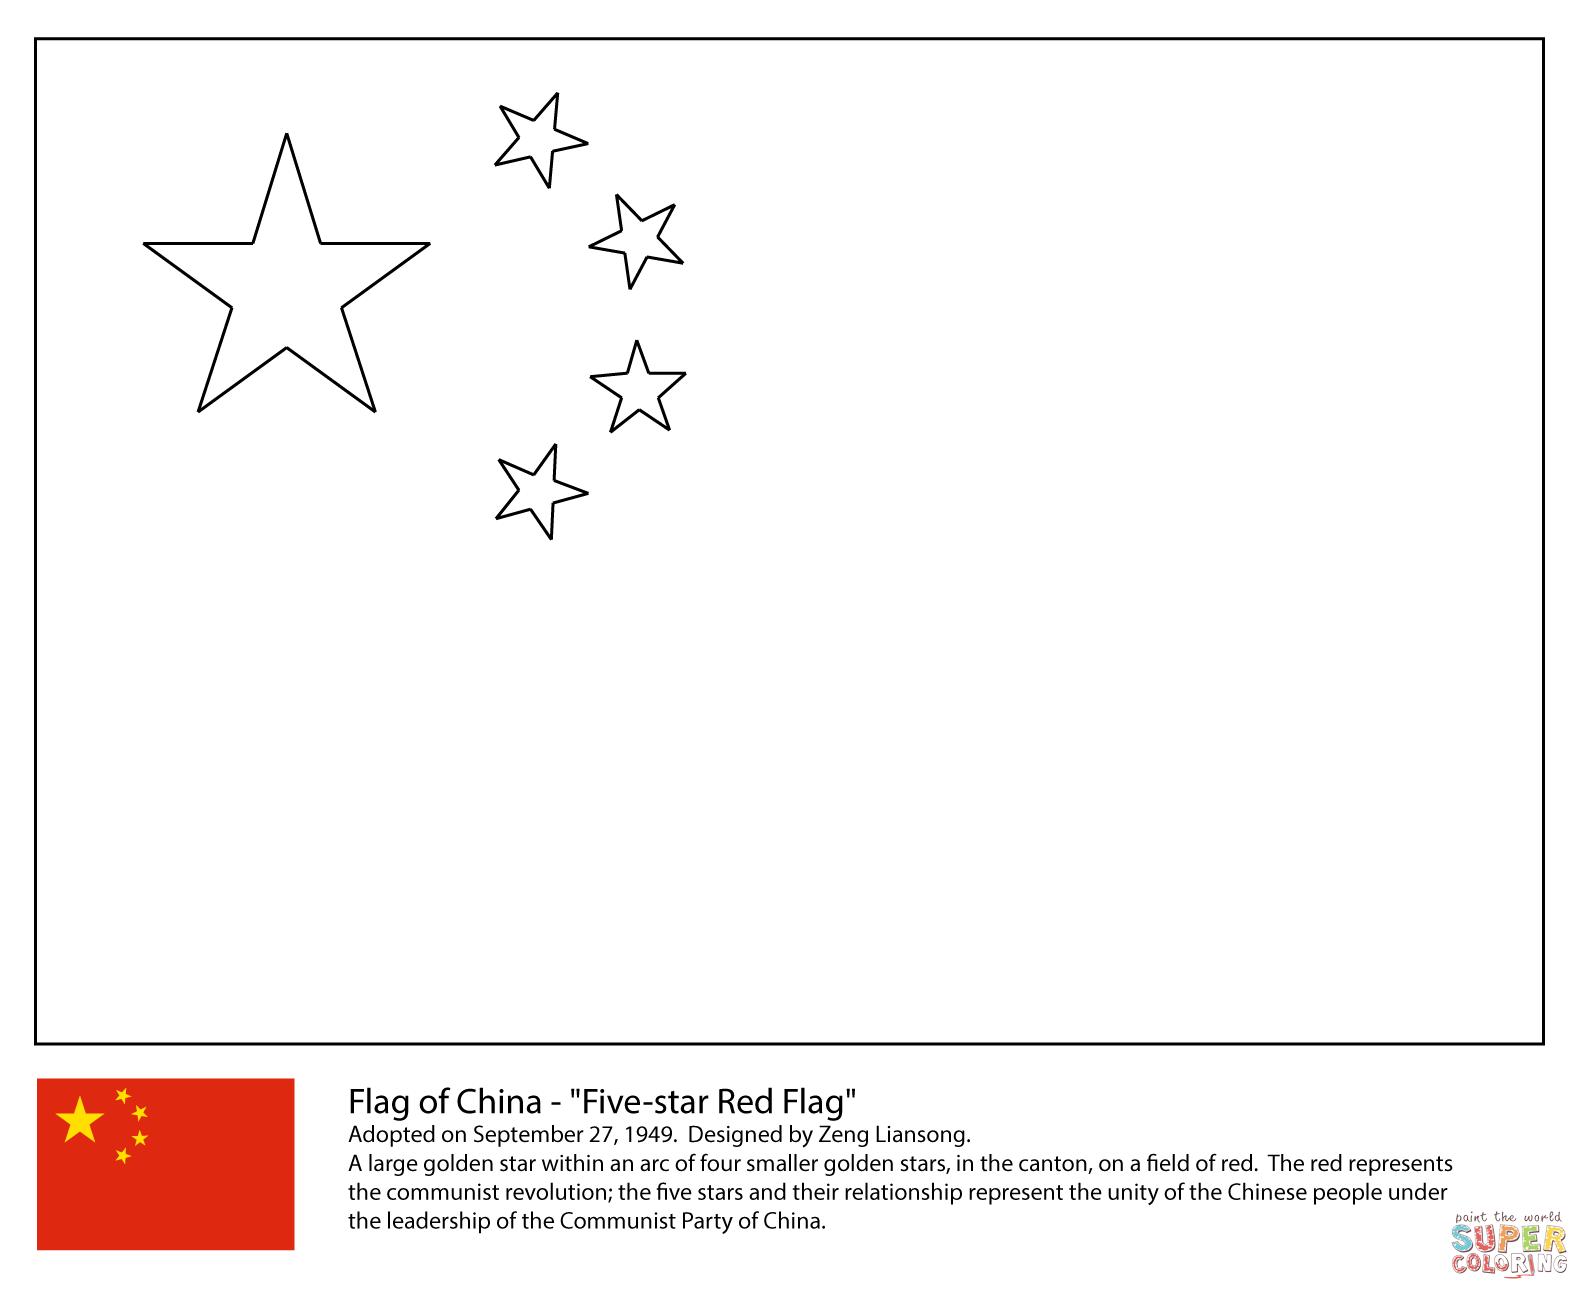 Flag Of China Coloring Page Free Printable Coloring Pages Flag Coloring Pages Printable Coloring Pages Coloring Pages